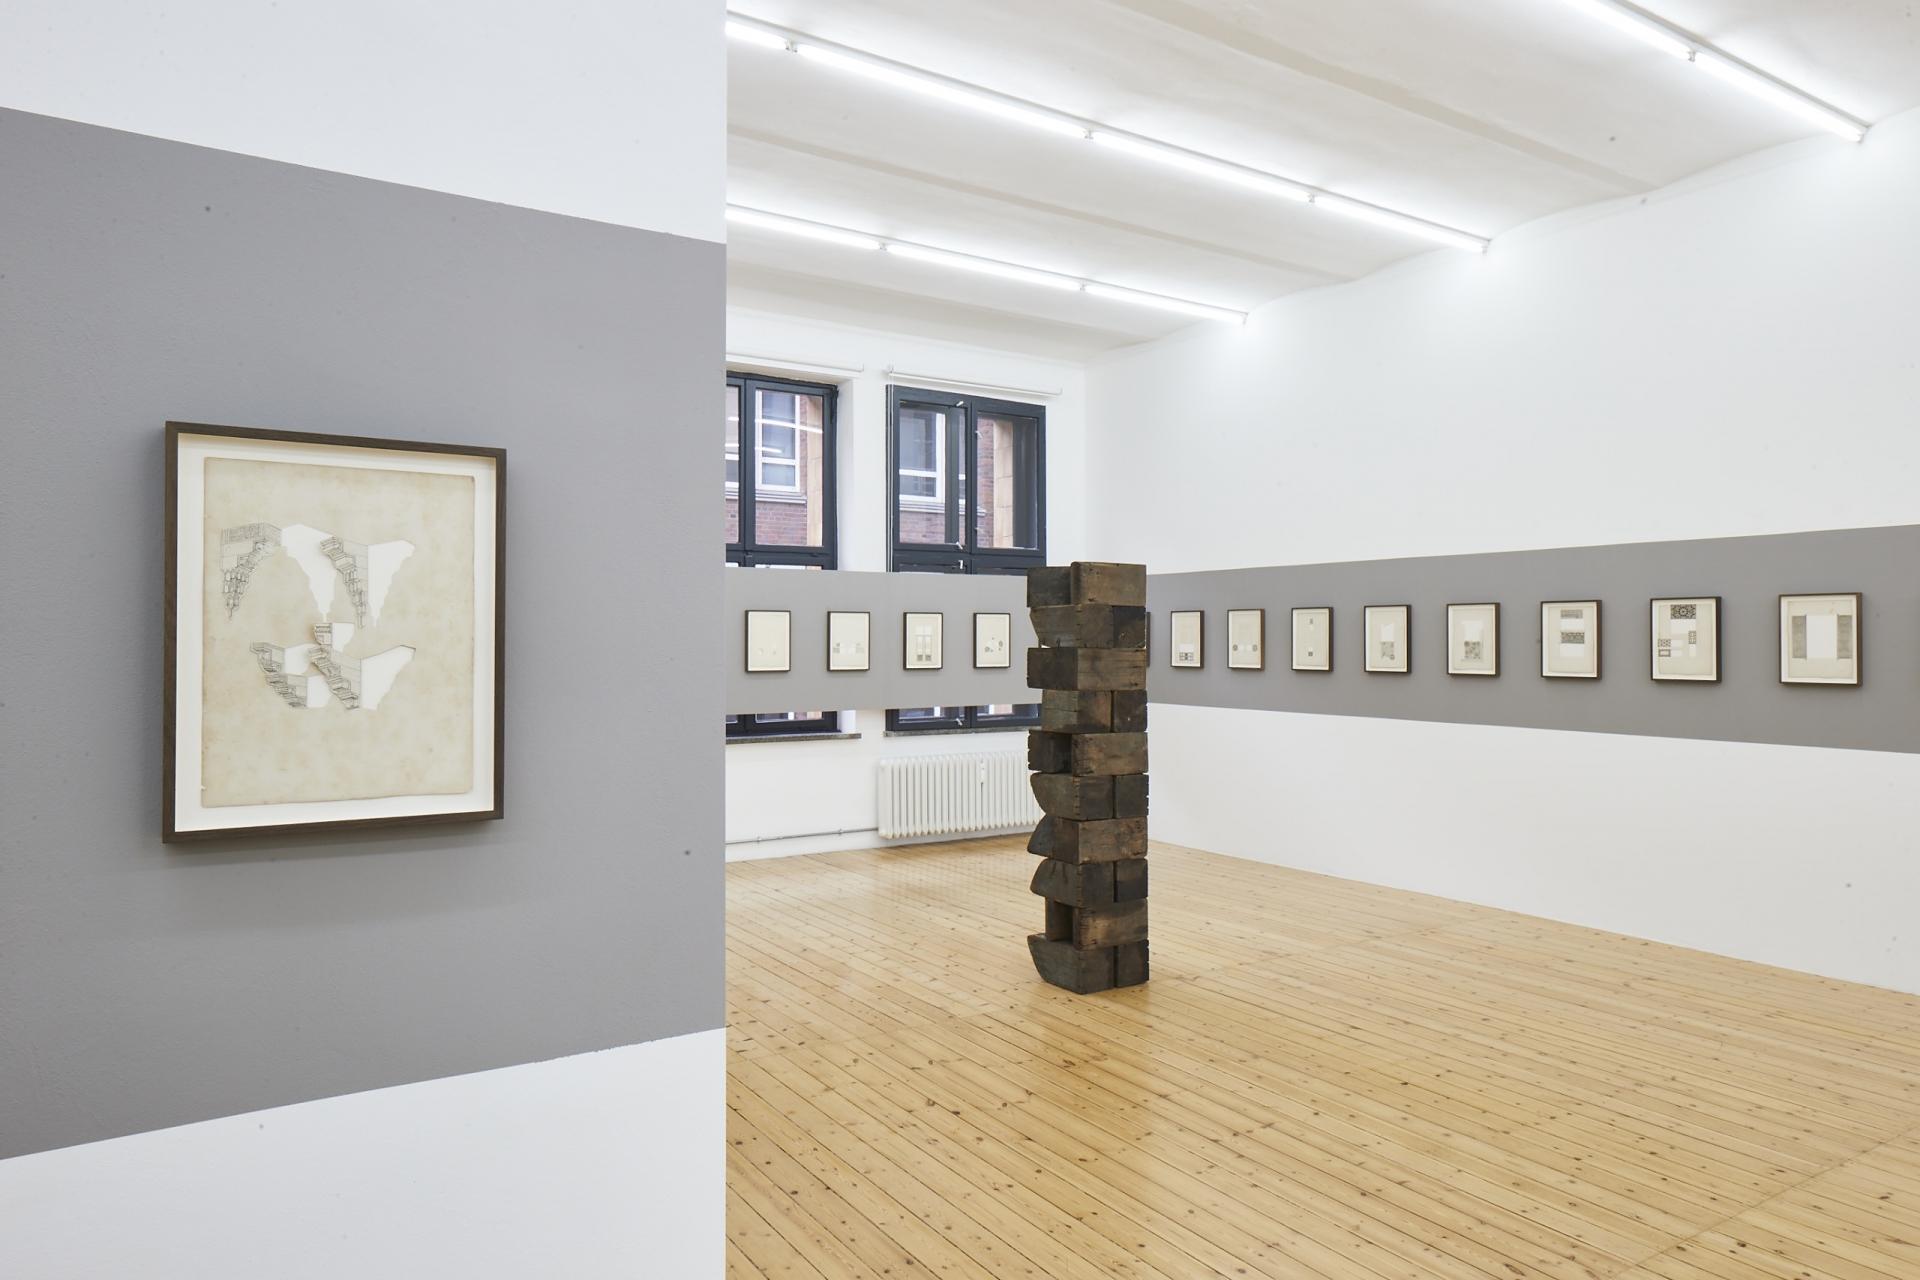 Rayyane Tabet, Arabeske, Exhibition view Sfeir-Semler Gallery Hamburg 2021